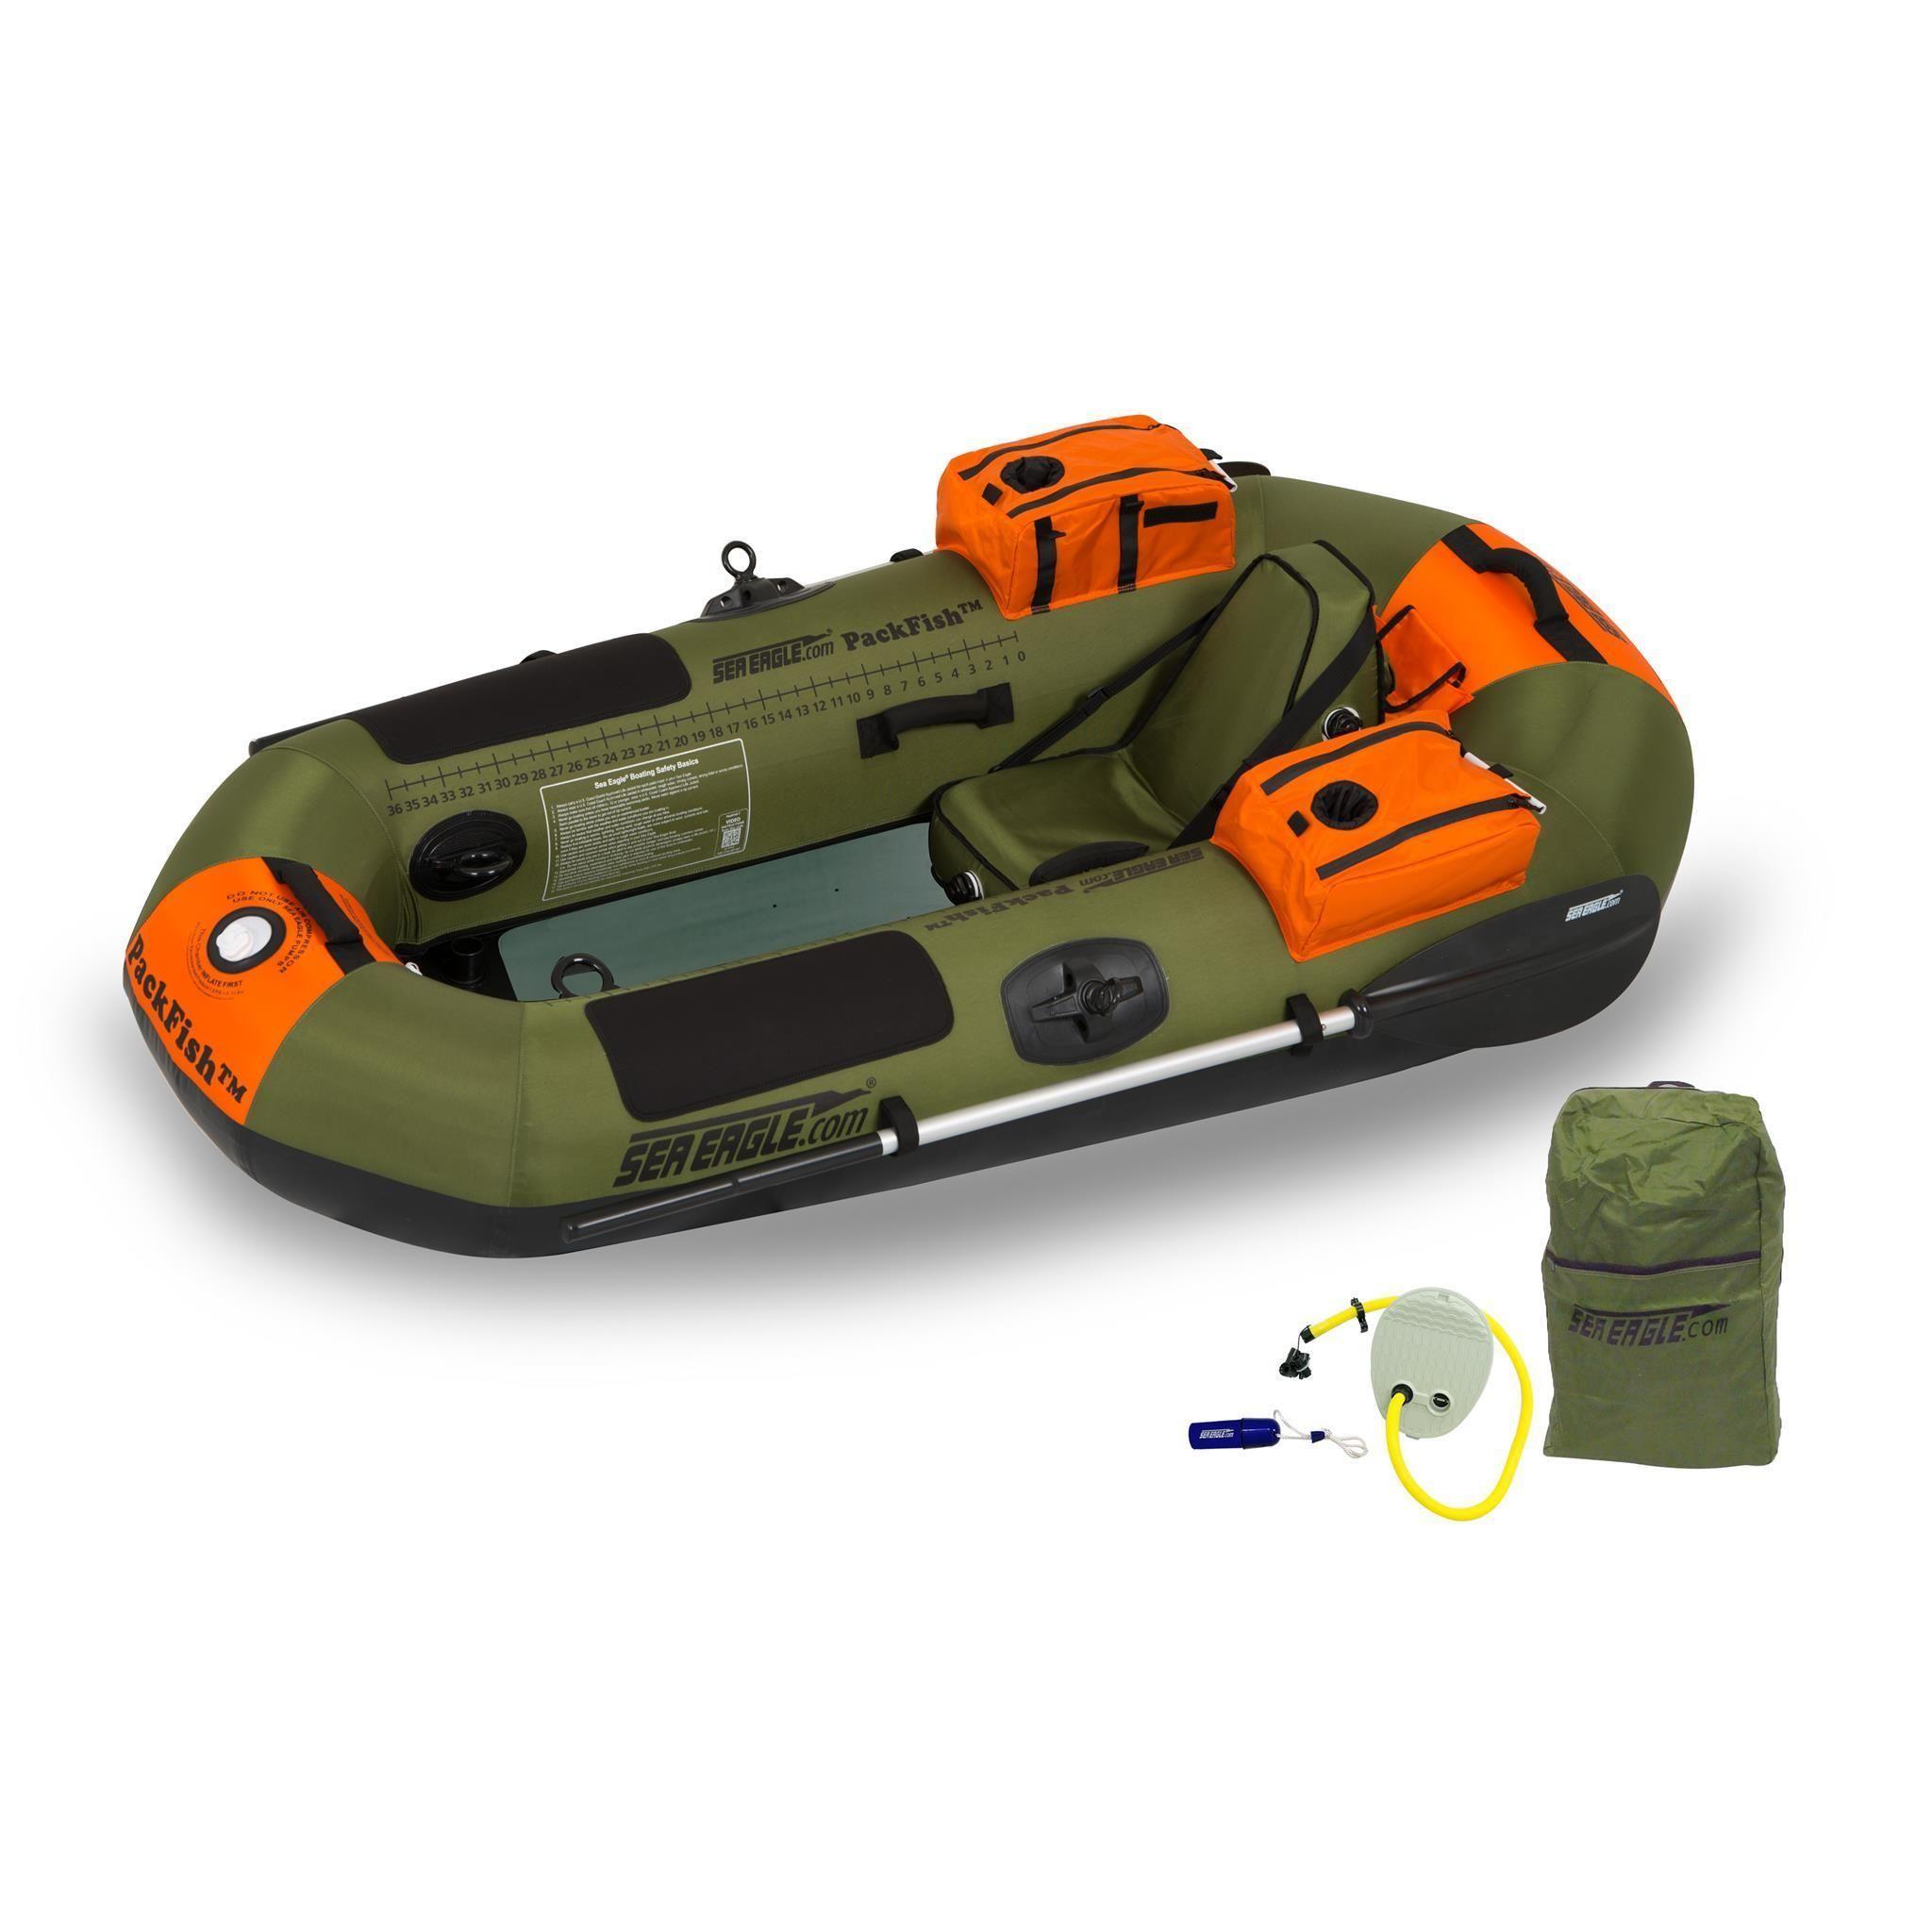 Overstock Com Online Shopping Bedding Furniture Electronics Jewelry Clothing More Angler Kayak Inflatable Boat Kayak Fishing